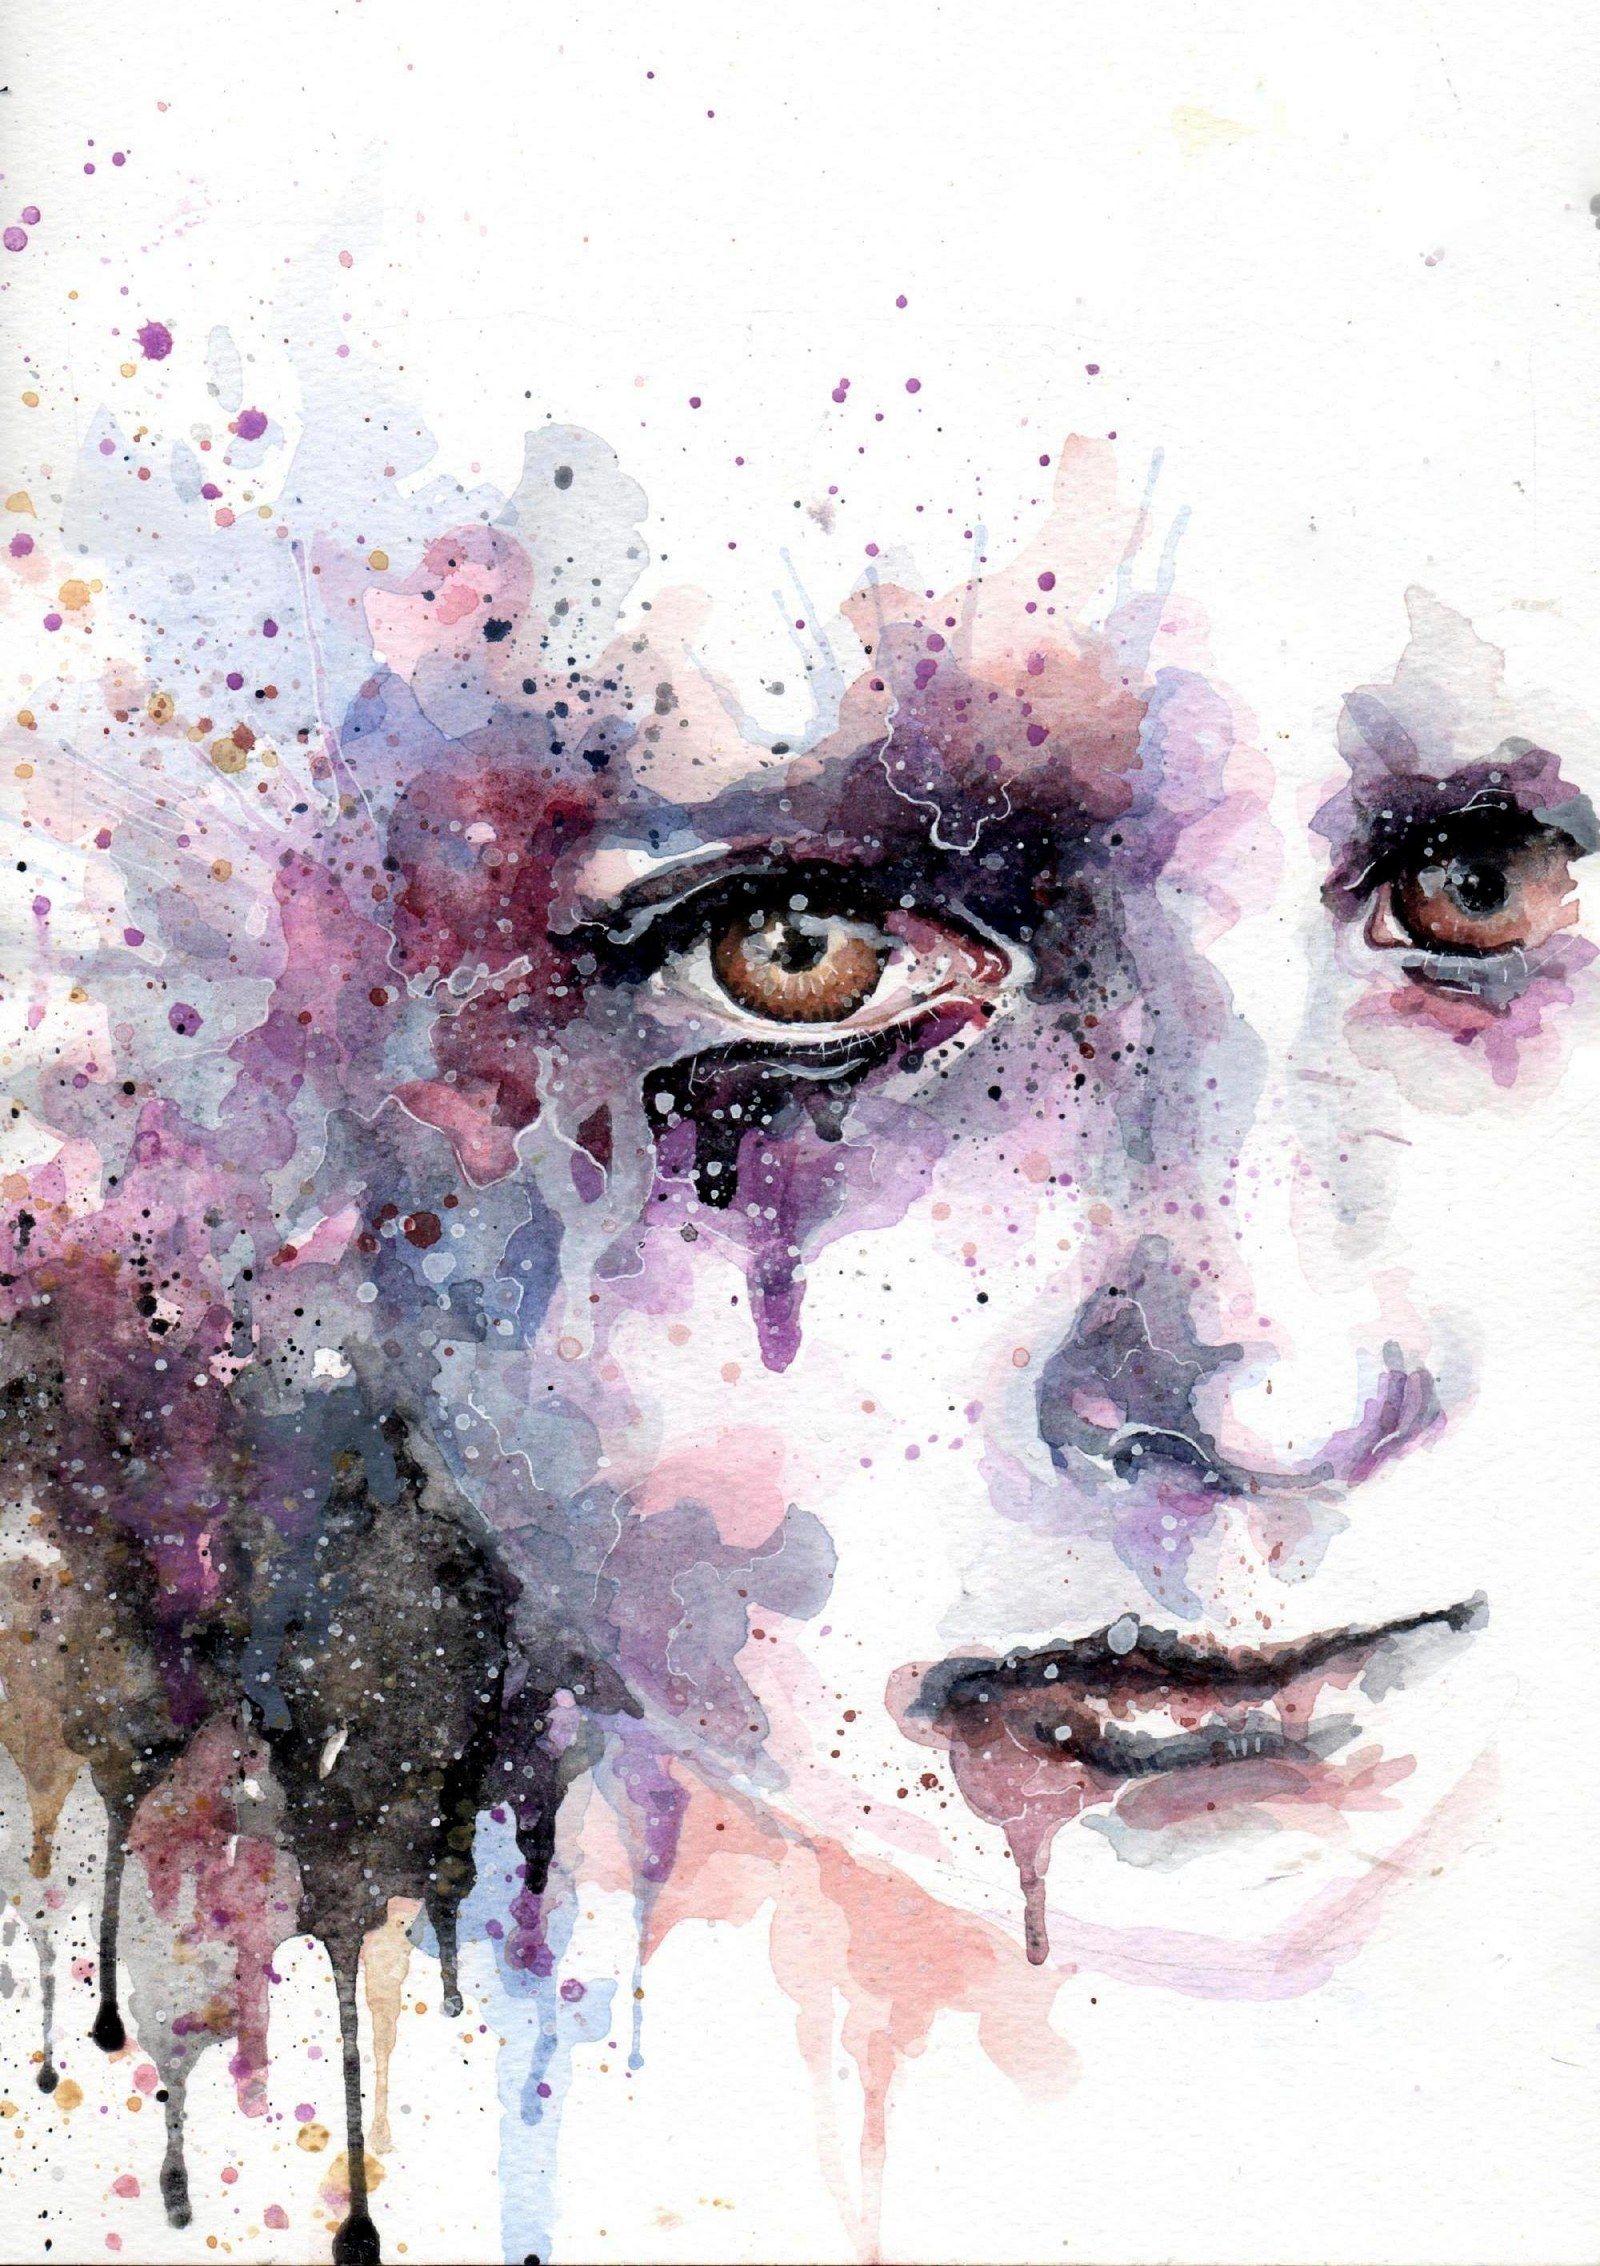 Lost In Misery Malba Akvarelem Jde O Obraz Formatu A4 Malovany